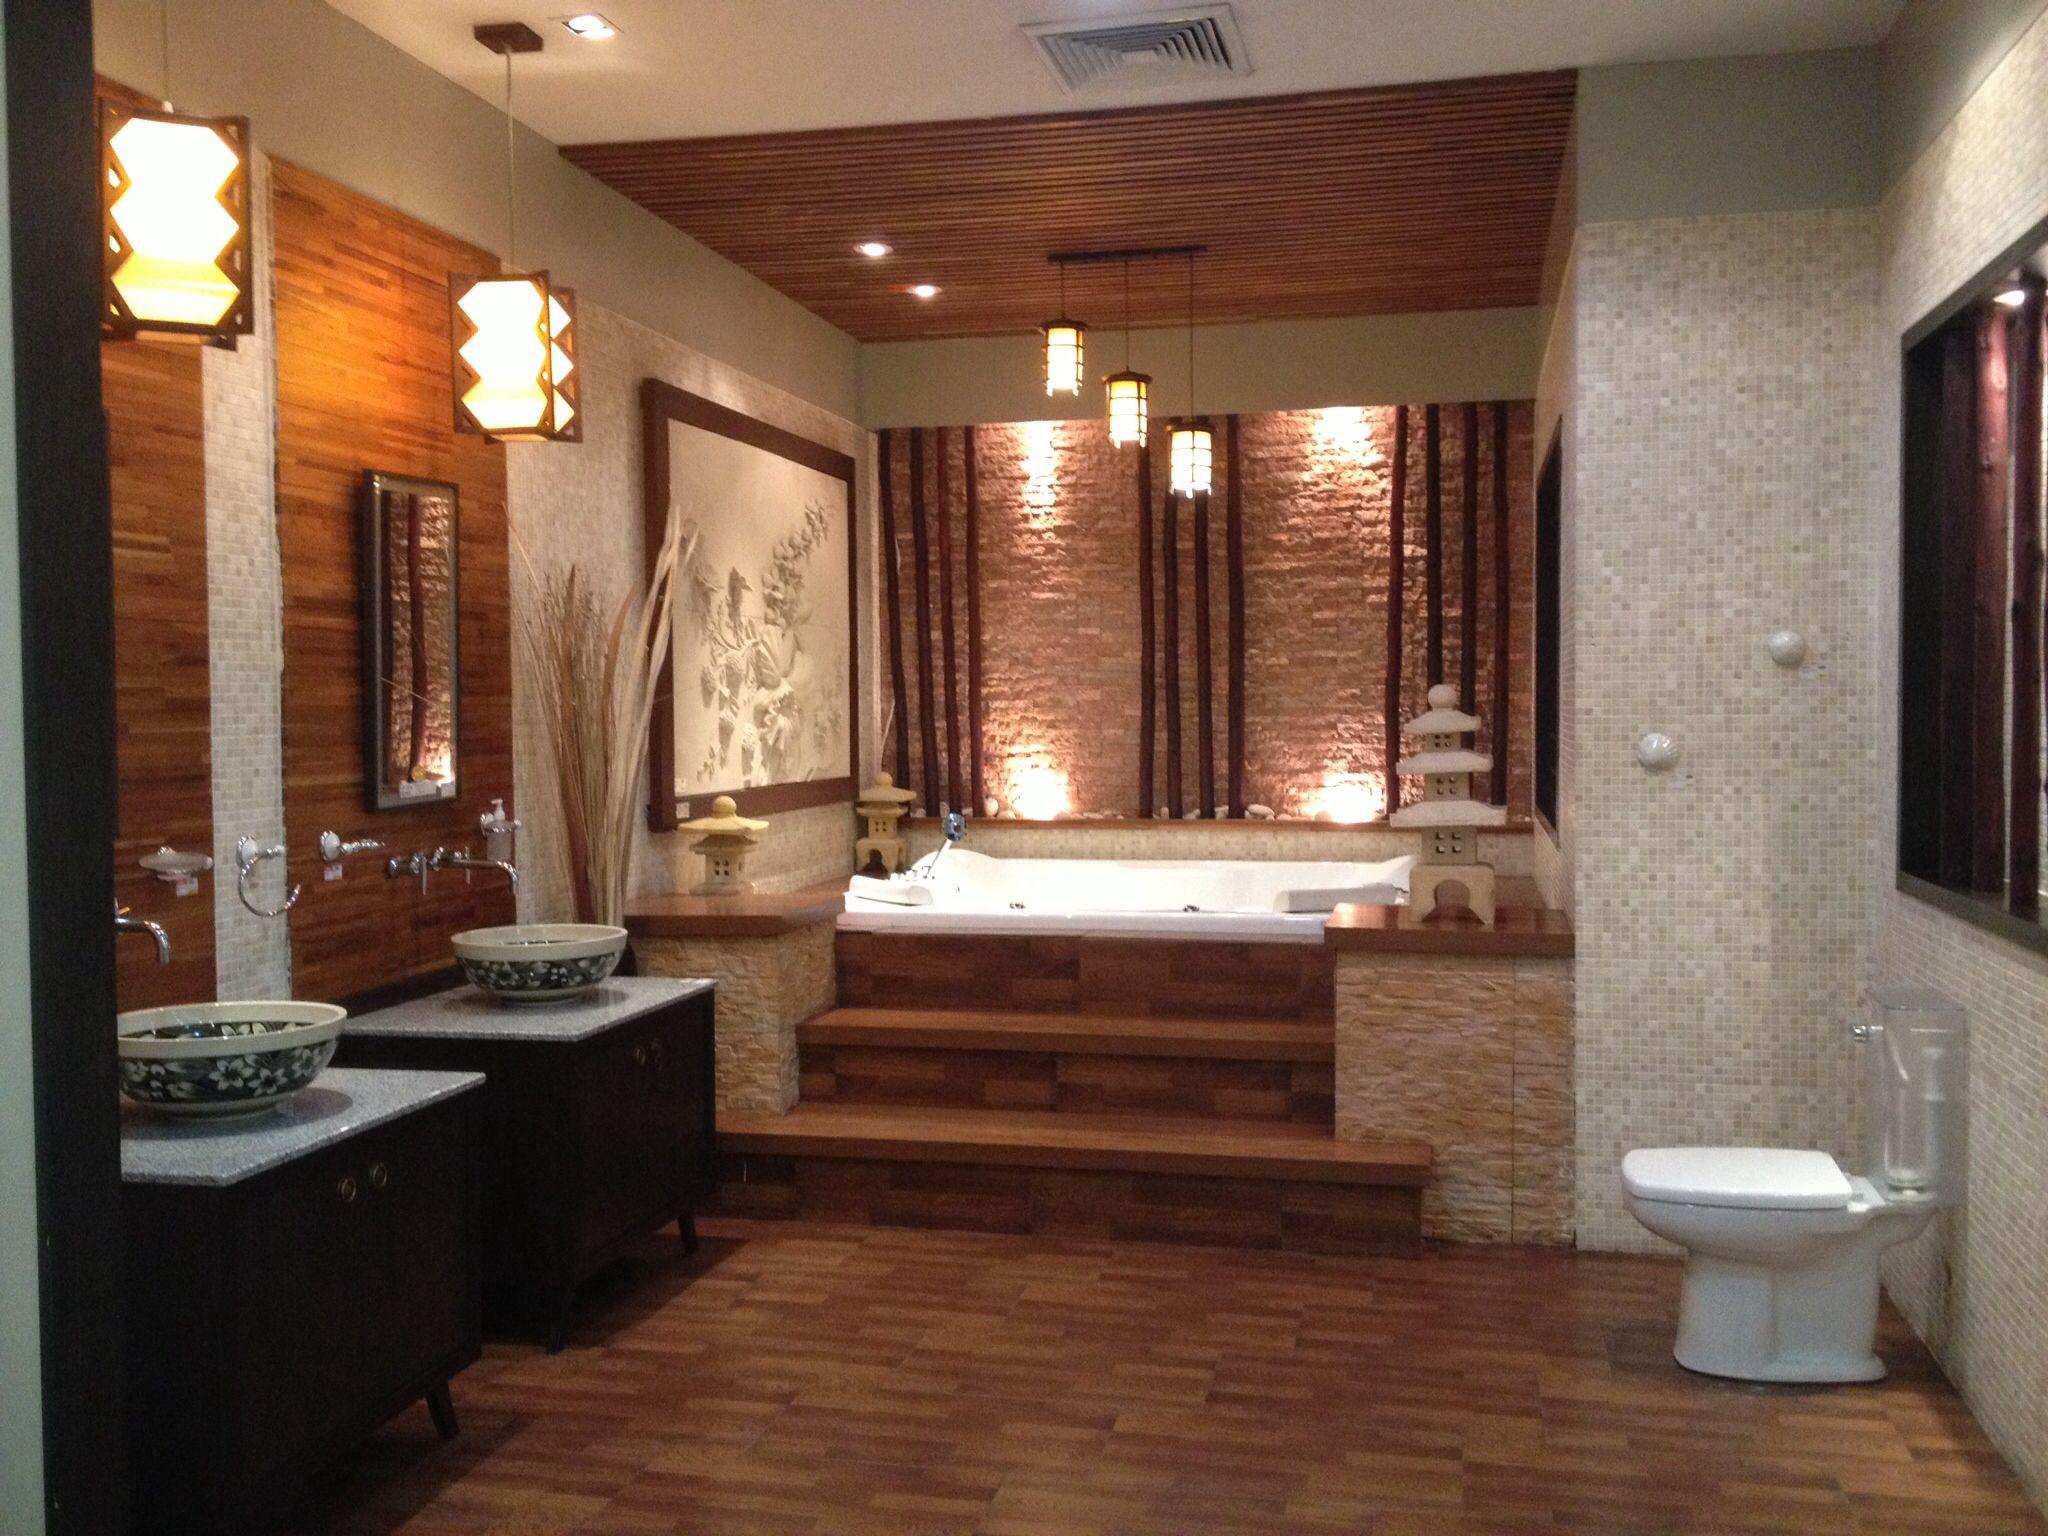 Bathroom with jacuzzi | Framed bathroom mirror, Bathroom ...